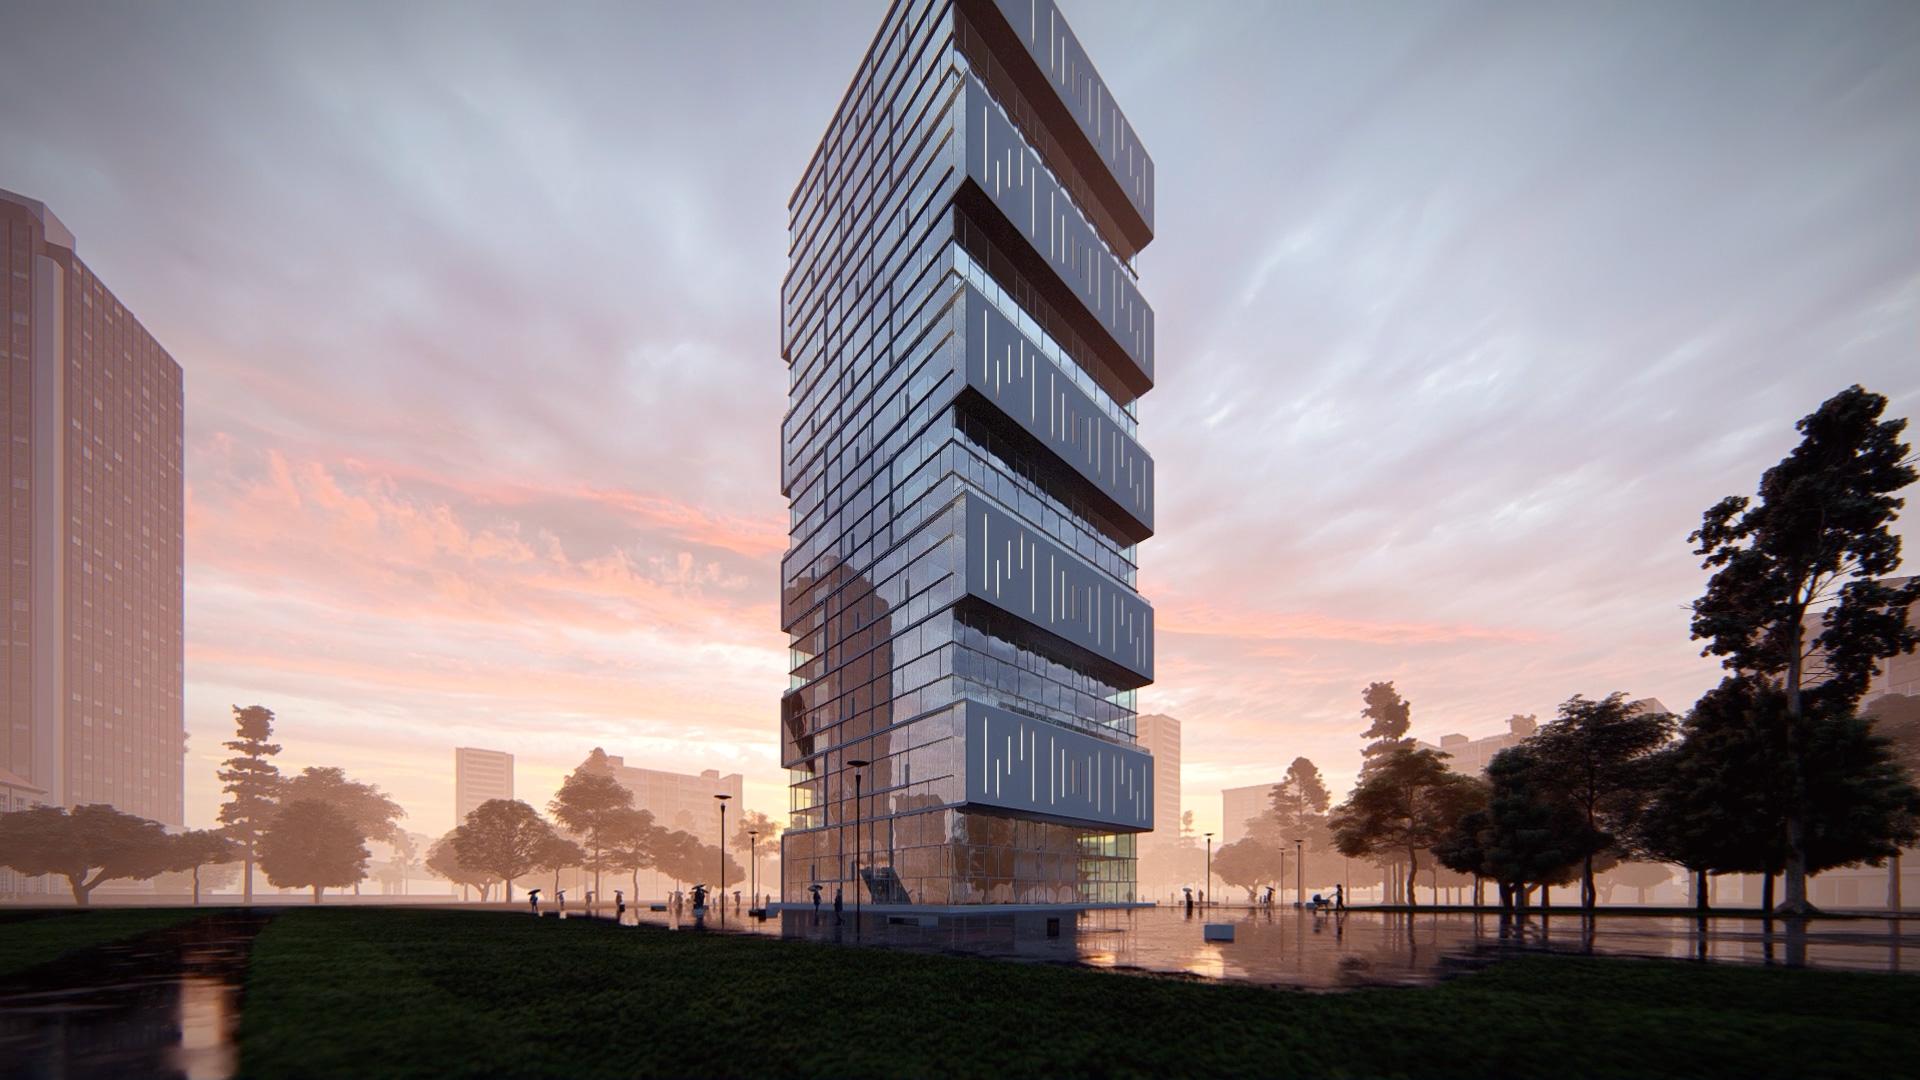 arhitektuurne 3d animatsioon pilve hoone loojang